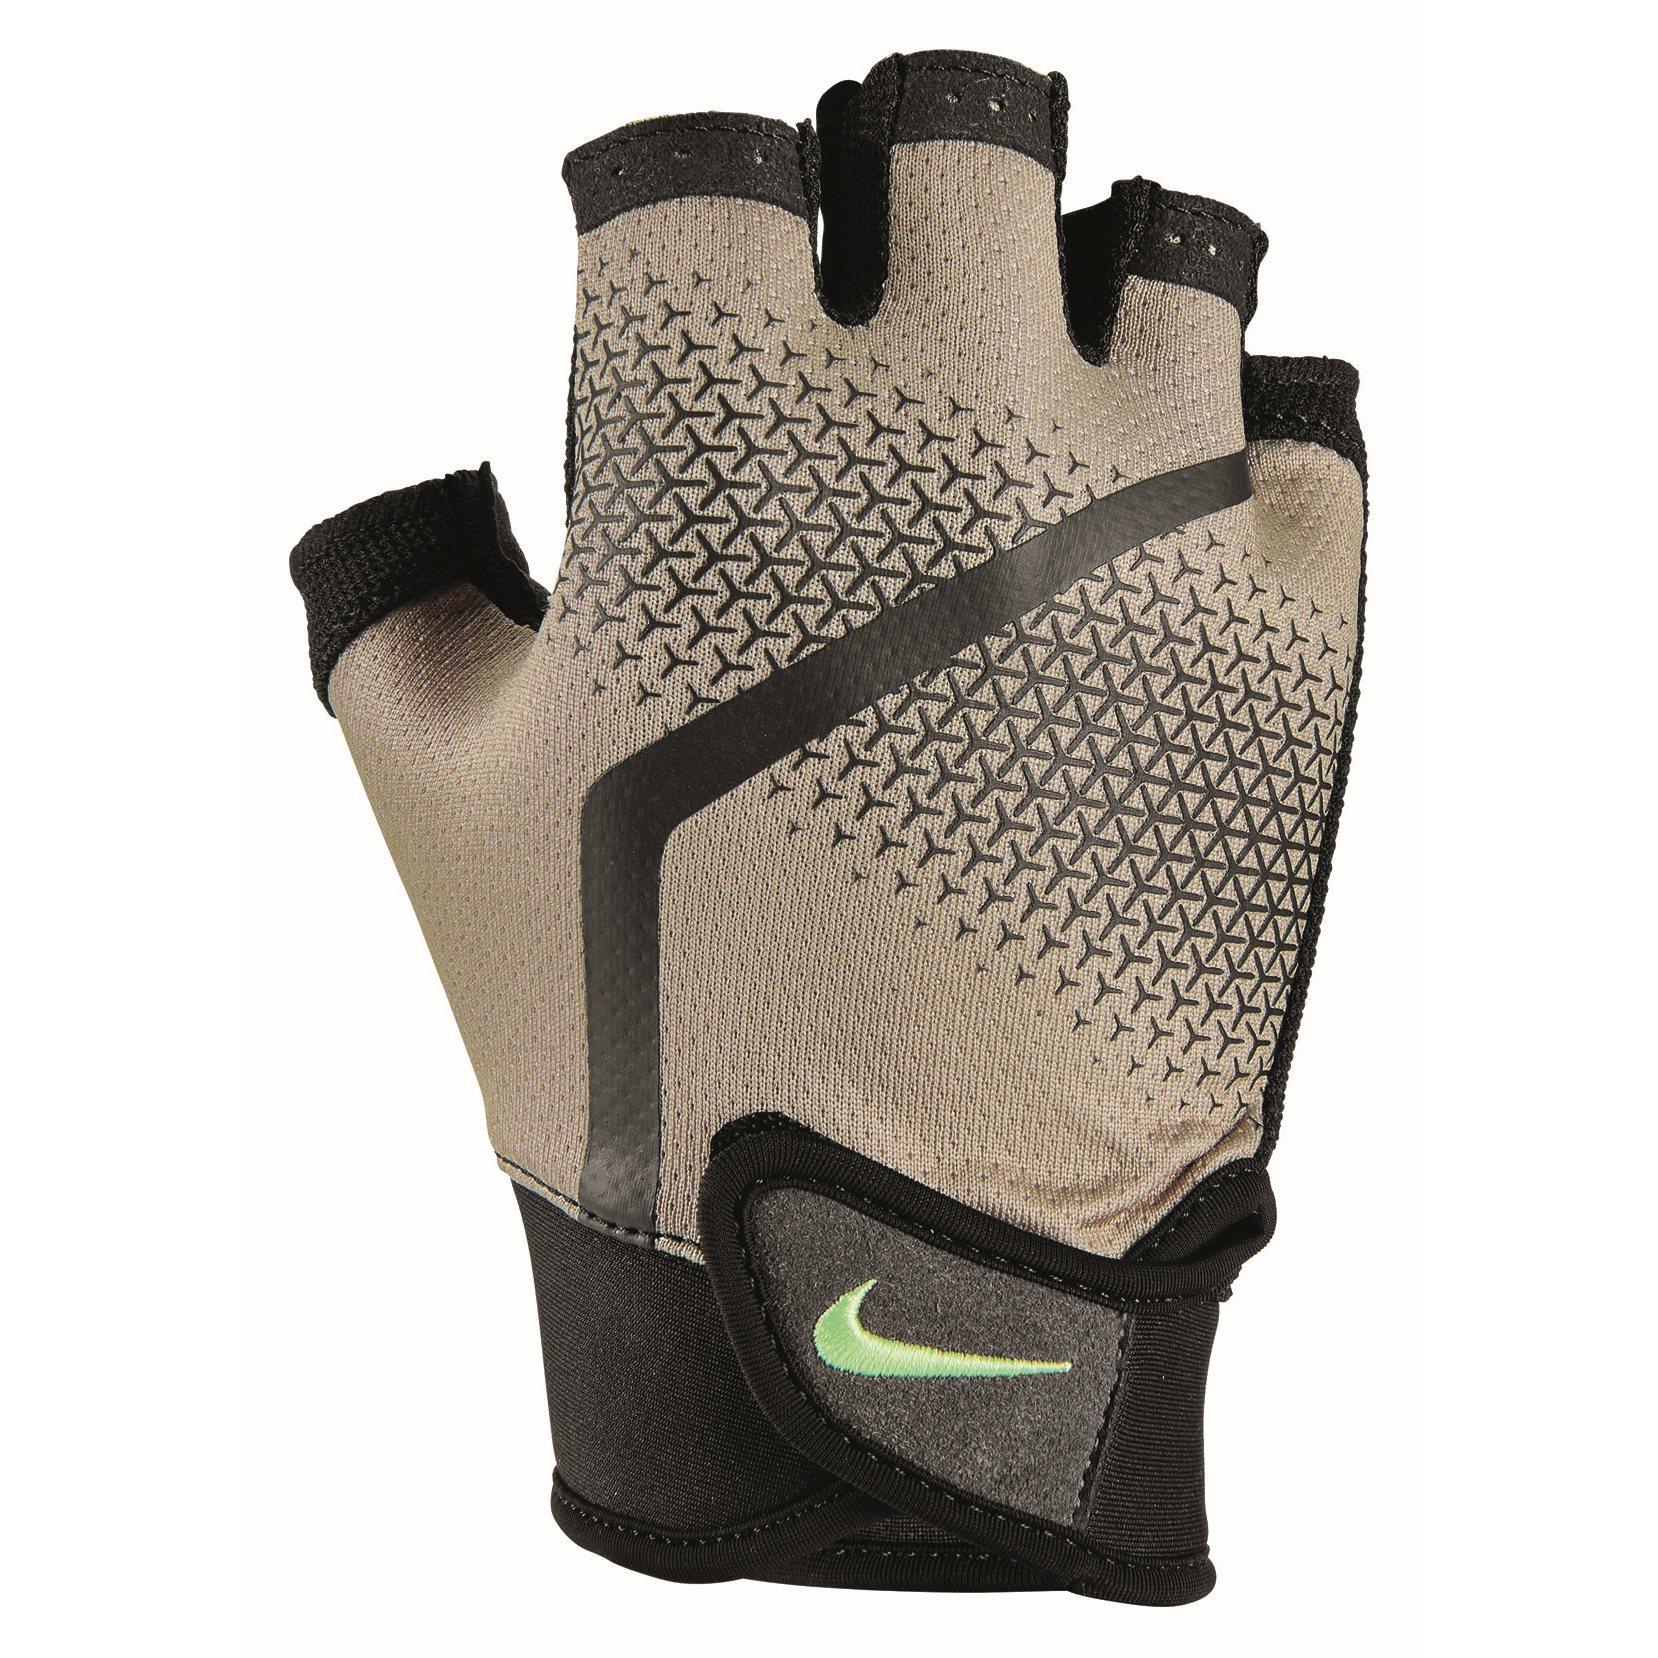 Foto de Nike Extreme Fitness Guantes para Hombre - khaki/black/lt lemon twist 263